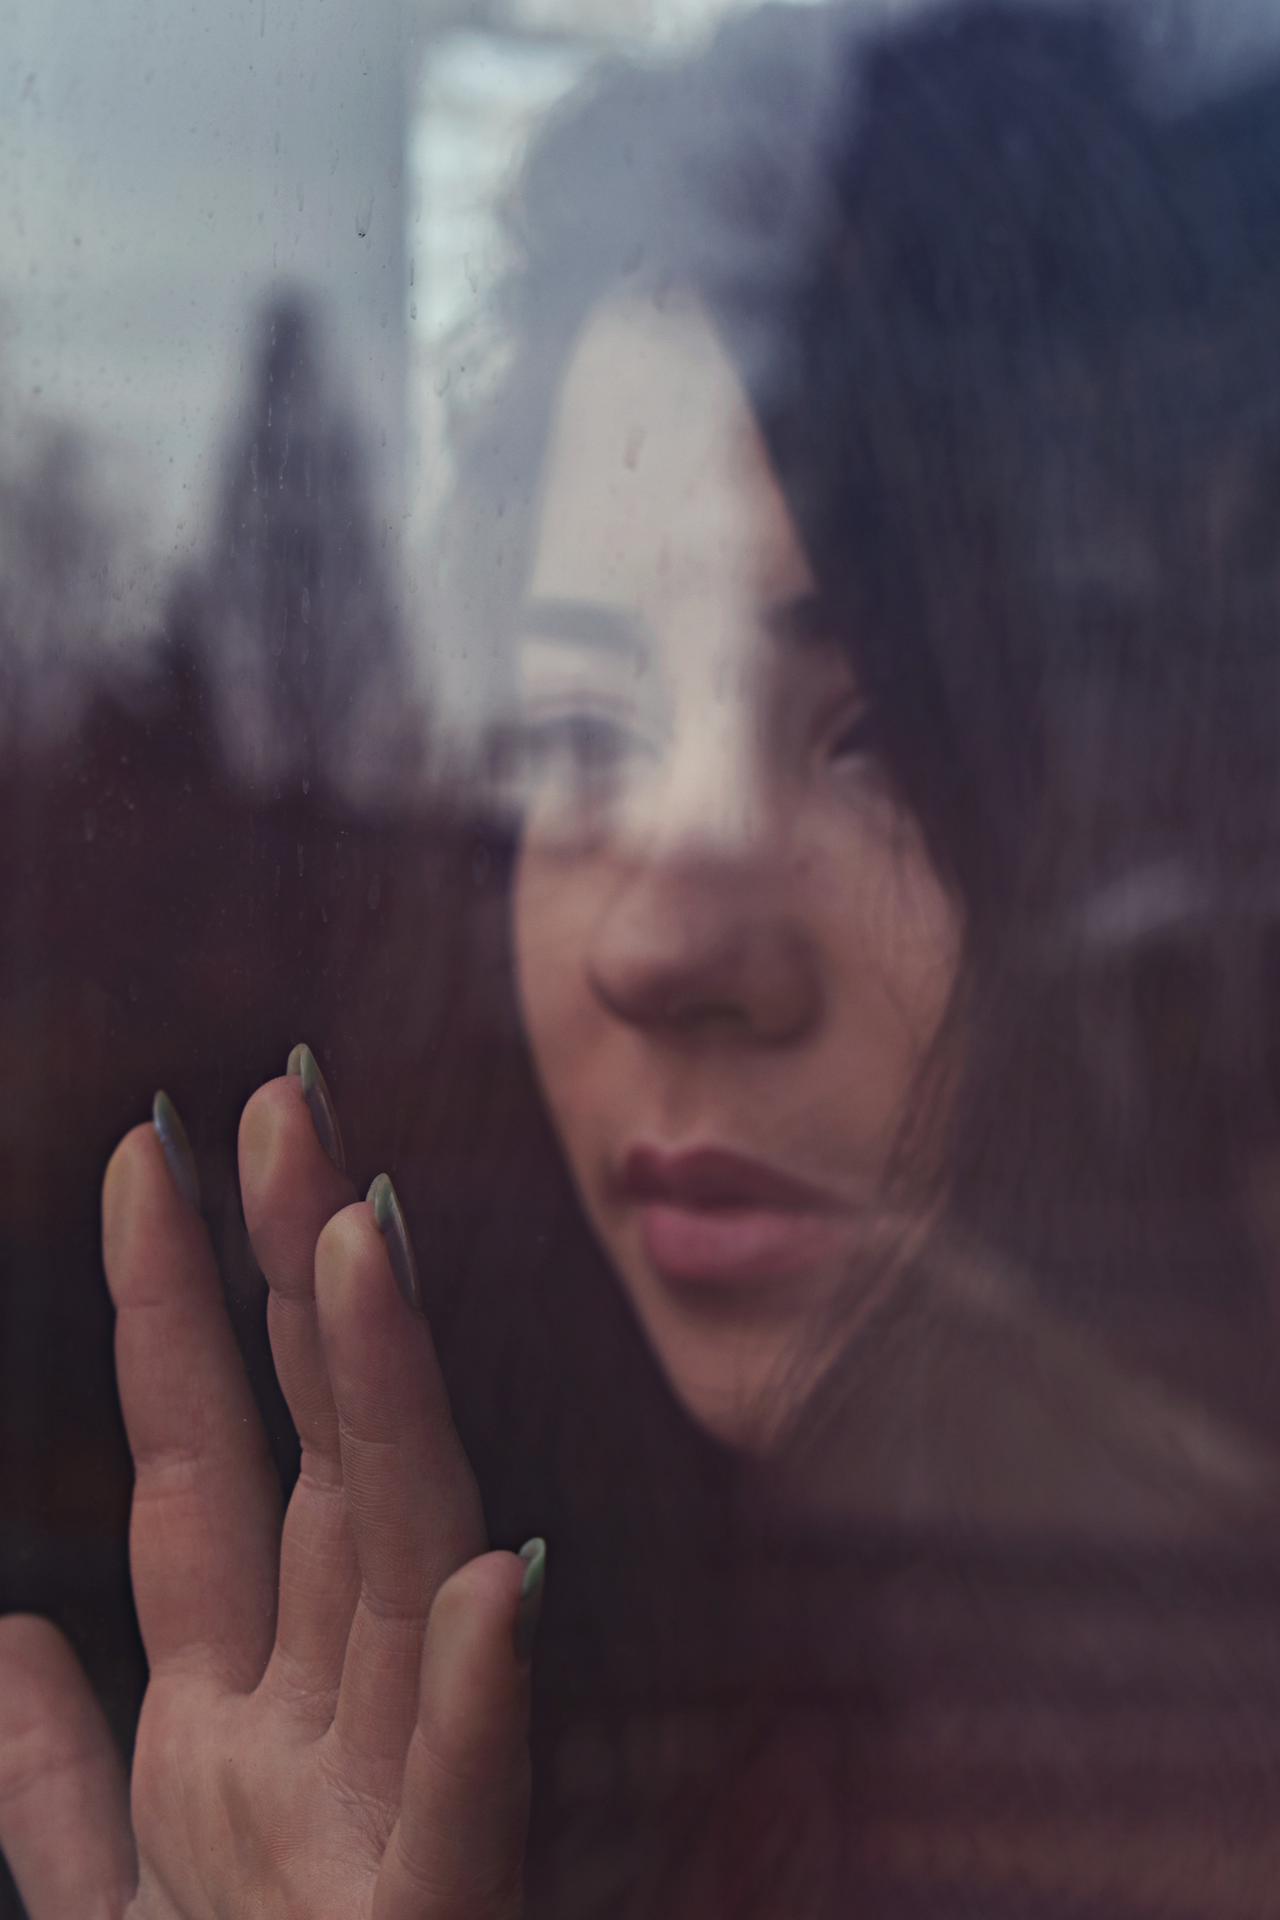 glass-person-sad-1871342.jpg